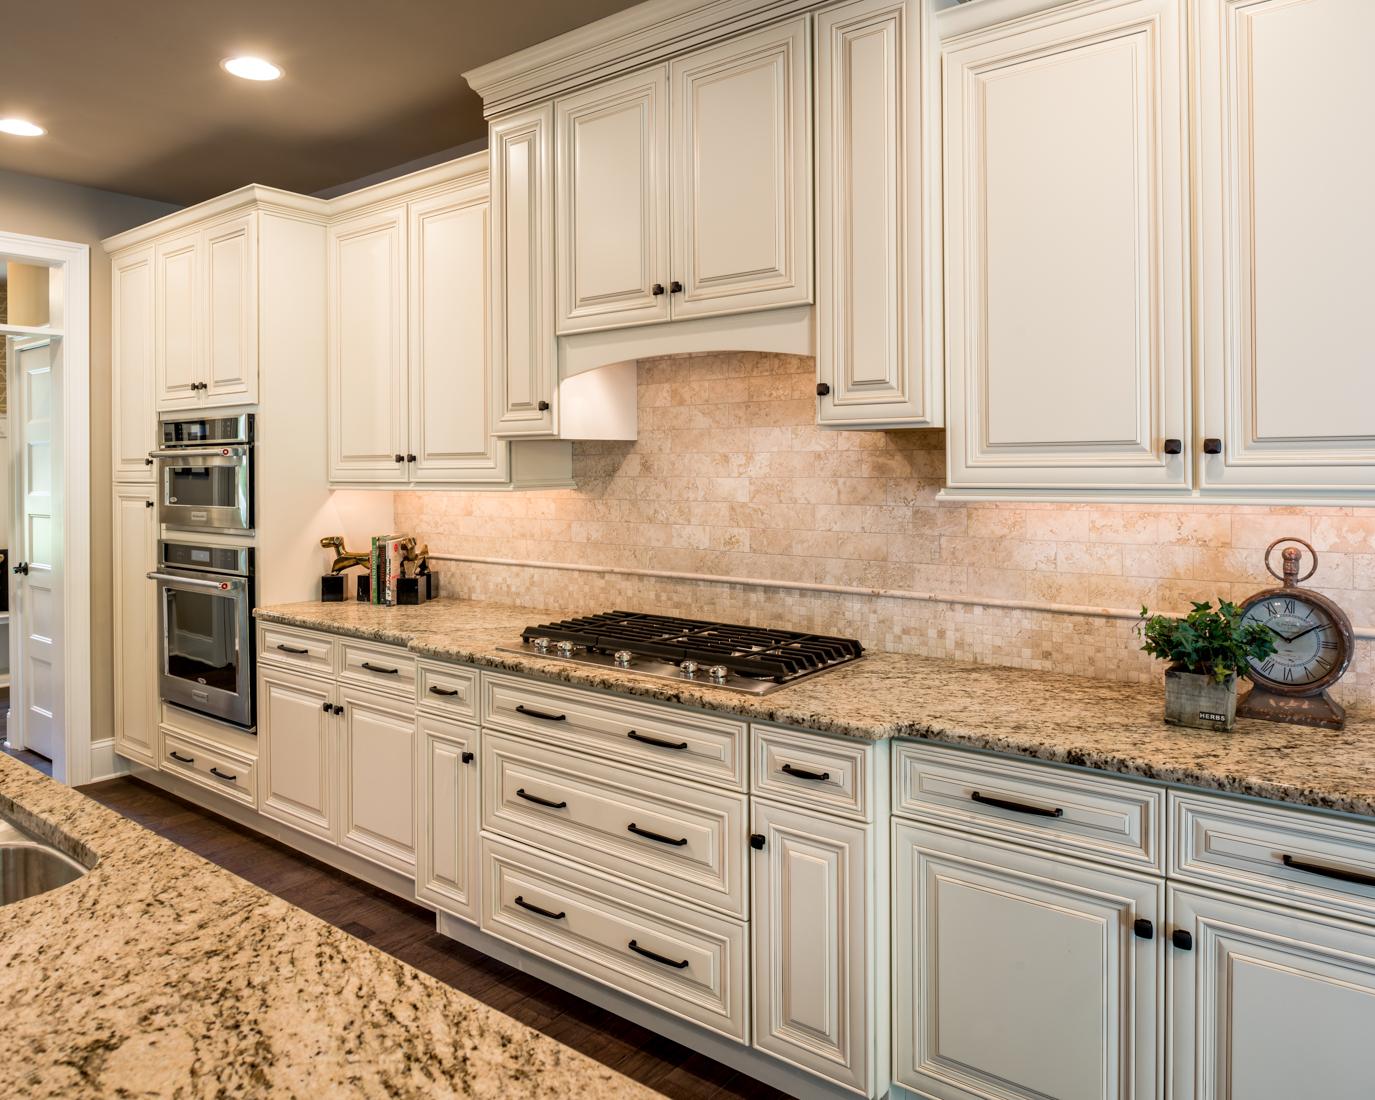 4 popular kitchen design trends of 2019  custom home group